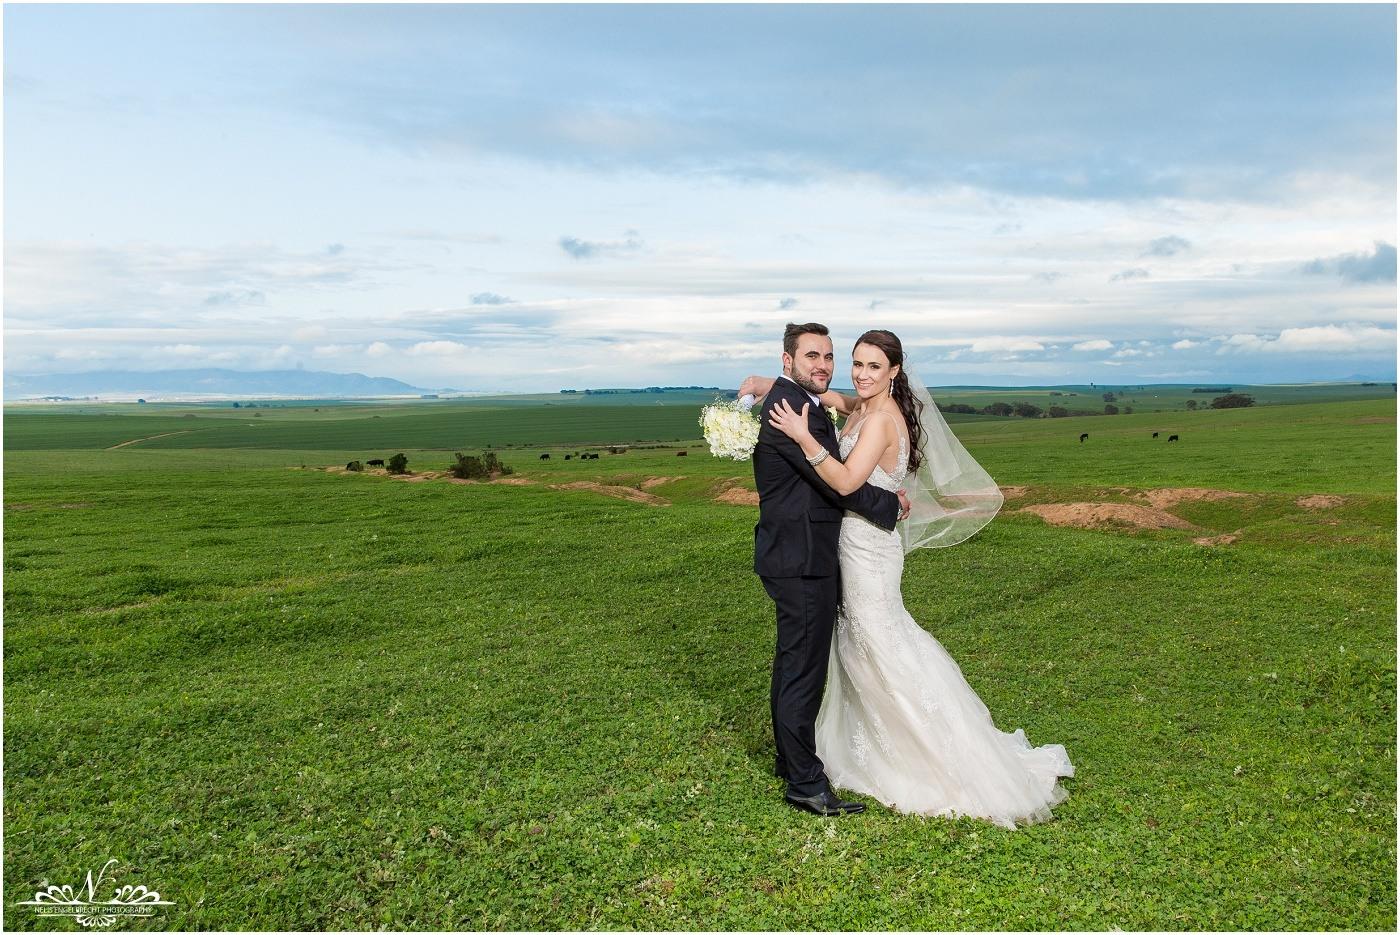 Eensgezind-Wedding-Photos-Nelis-Engelbrecht-Photography-094